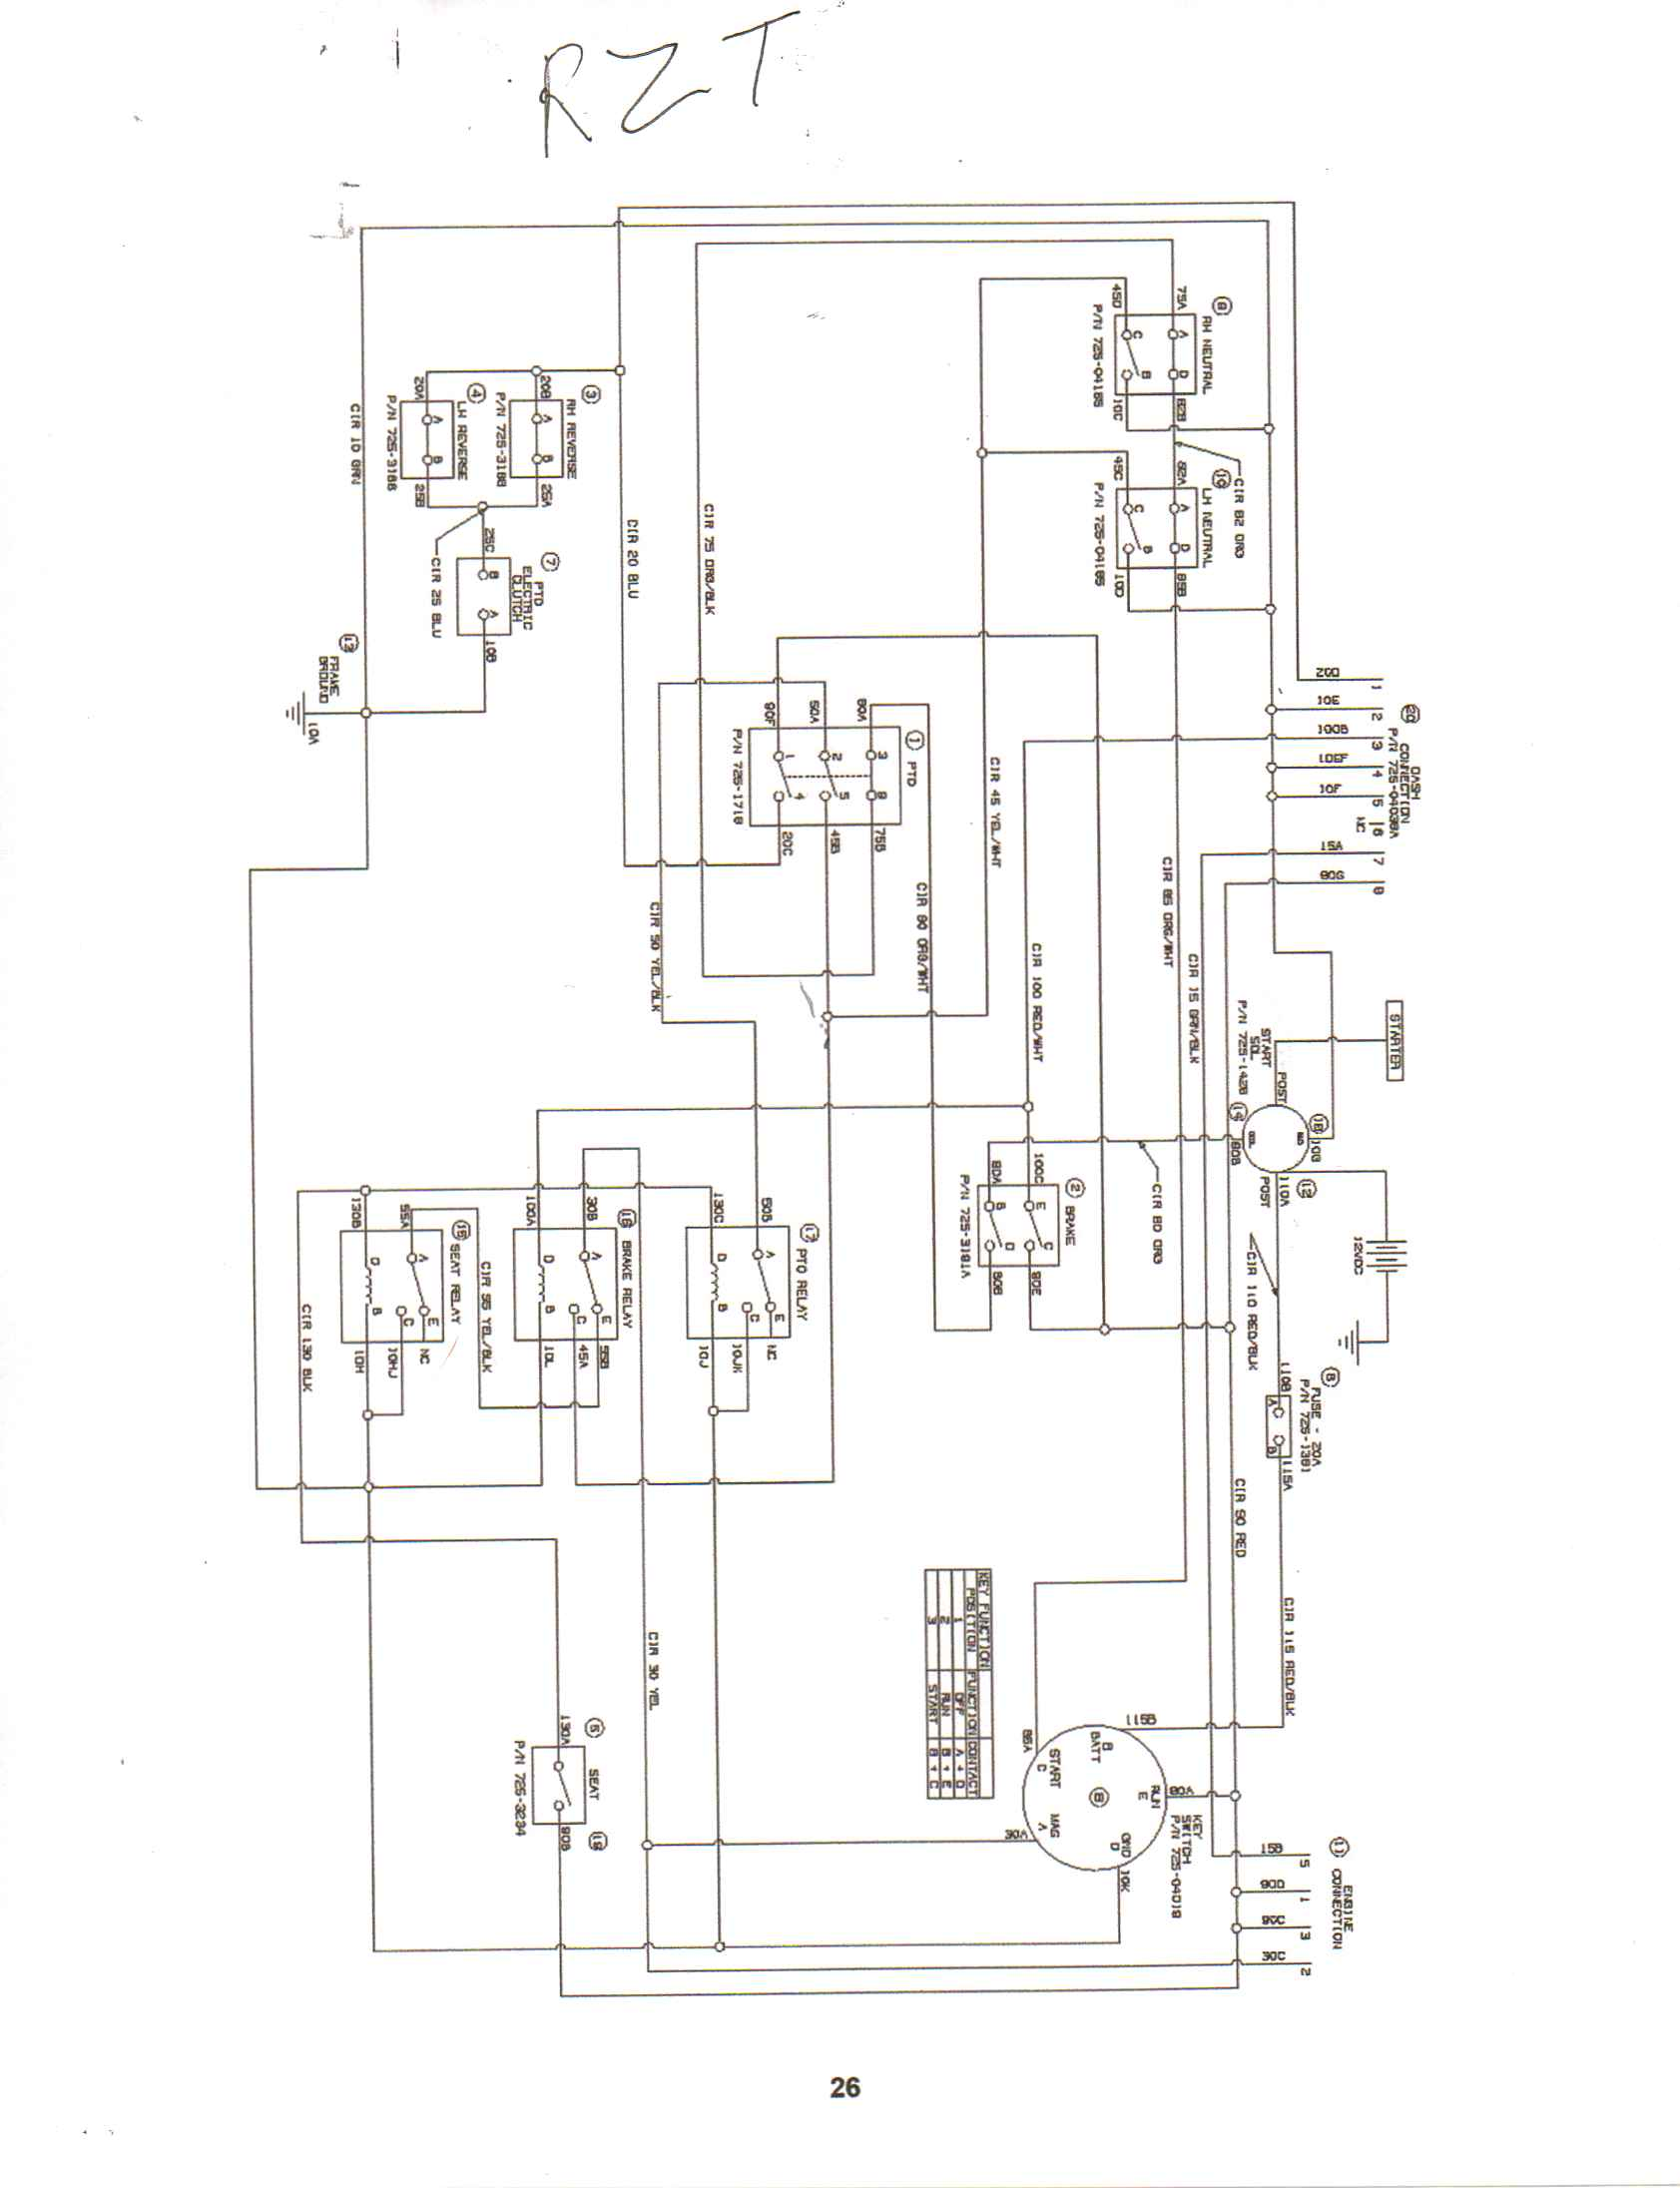 Wiring Diagram For A Cub Cadet Rzt 50